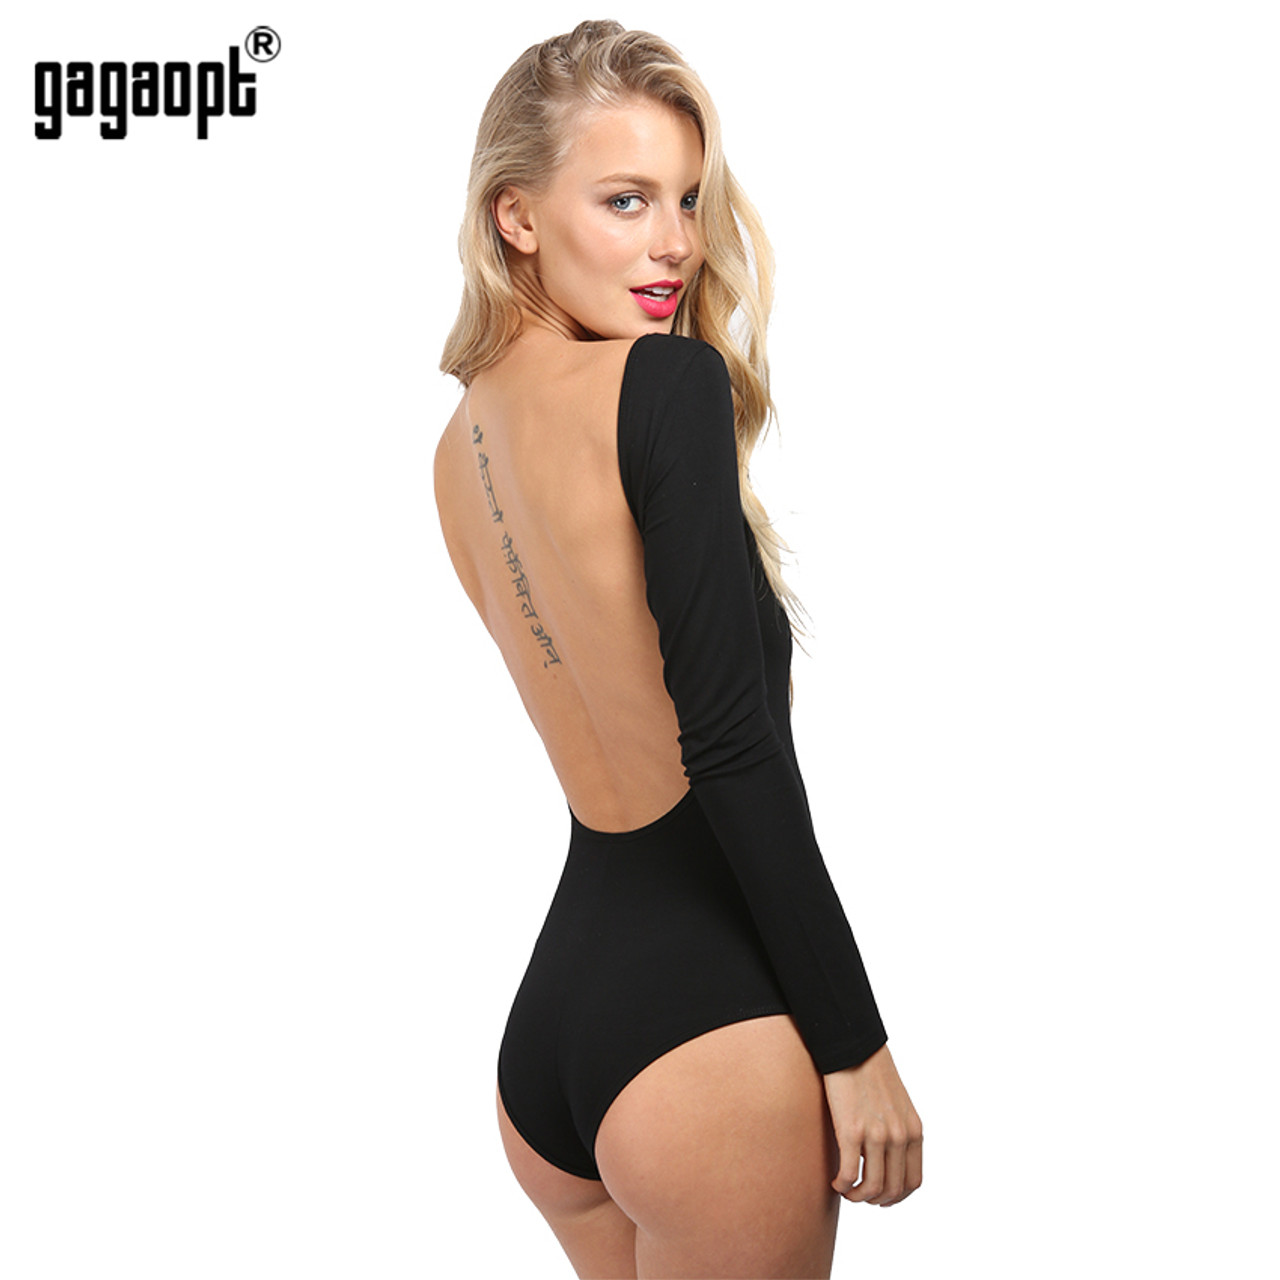 313dcc28 Gagaopt Backless Bodysuit Long Sleeve Sexy Bodysuit Black Summer Overalls  Body for women Combinaison Femme Blusa ...